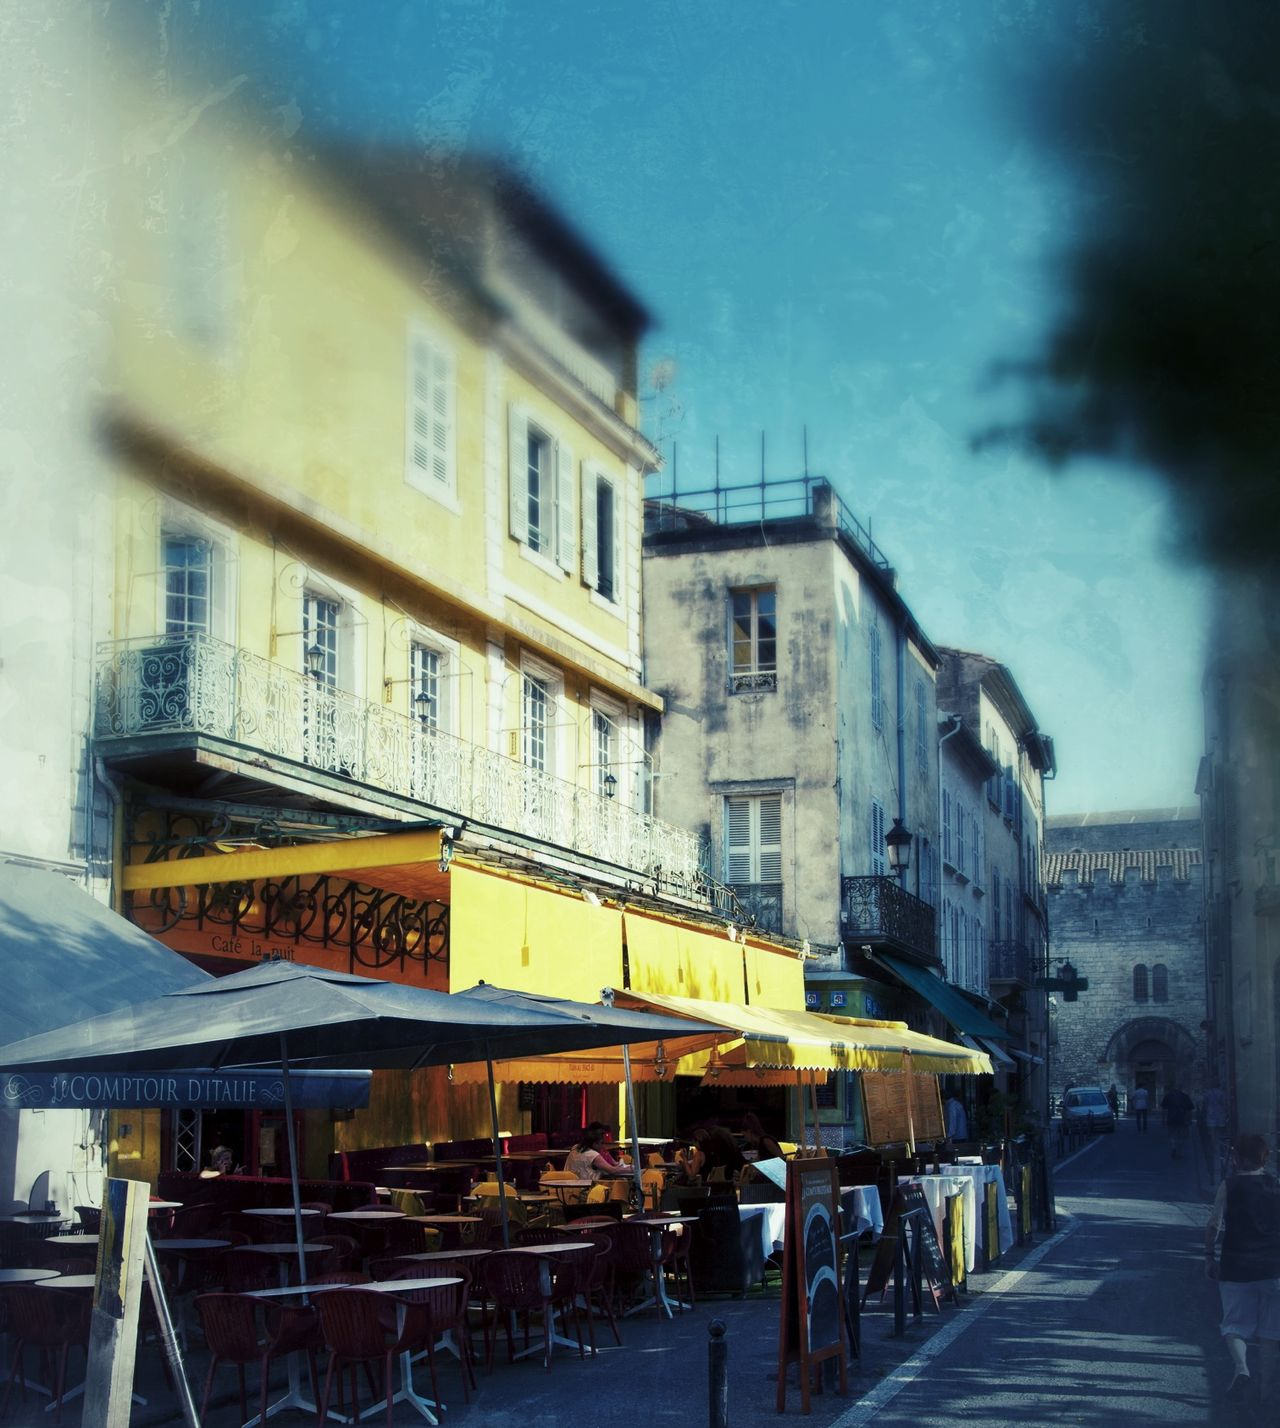 Cafe Terrace at Night in Arles, France Arles Cafe Terrace At Night Famous Place France Landmark Van Gogh Vincent Van Gogh